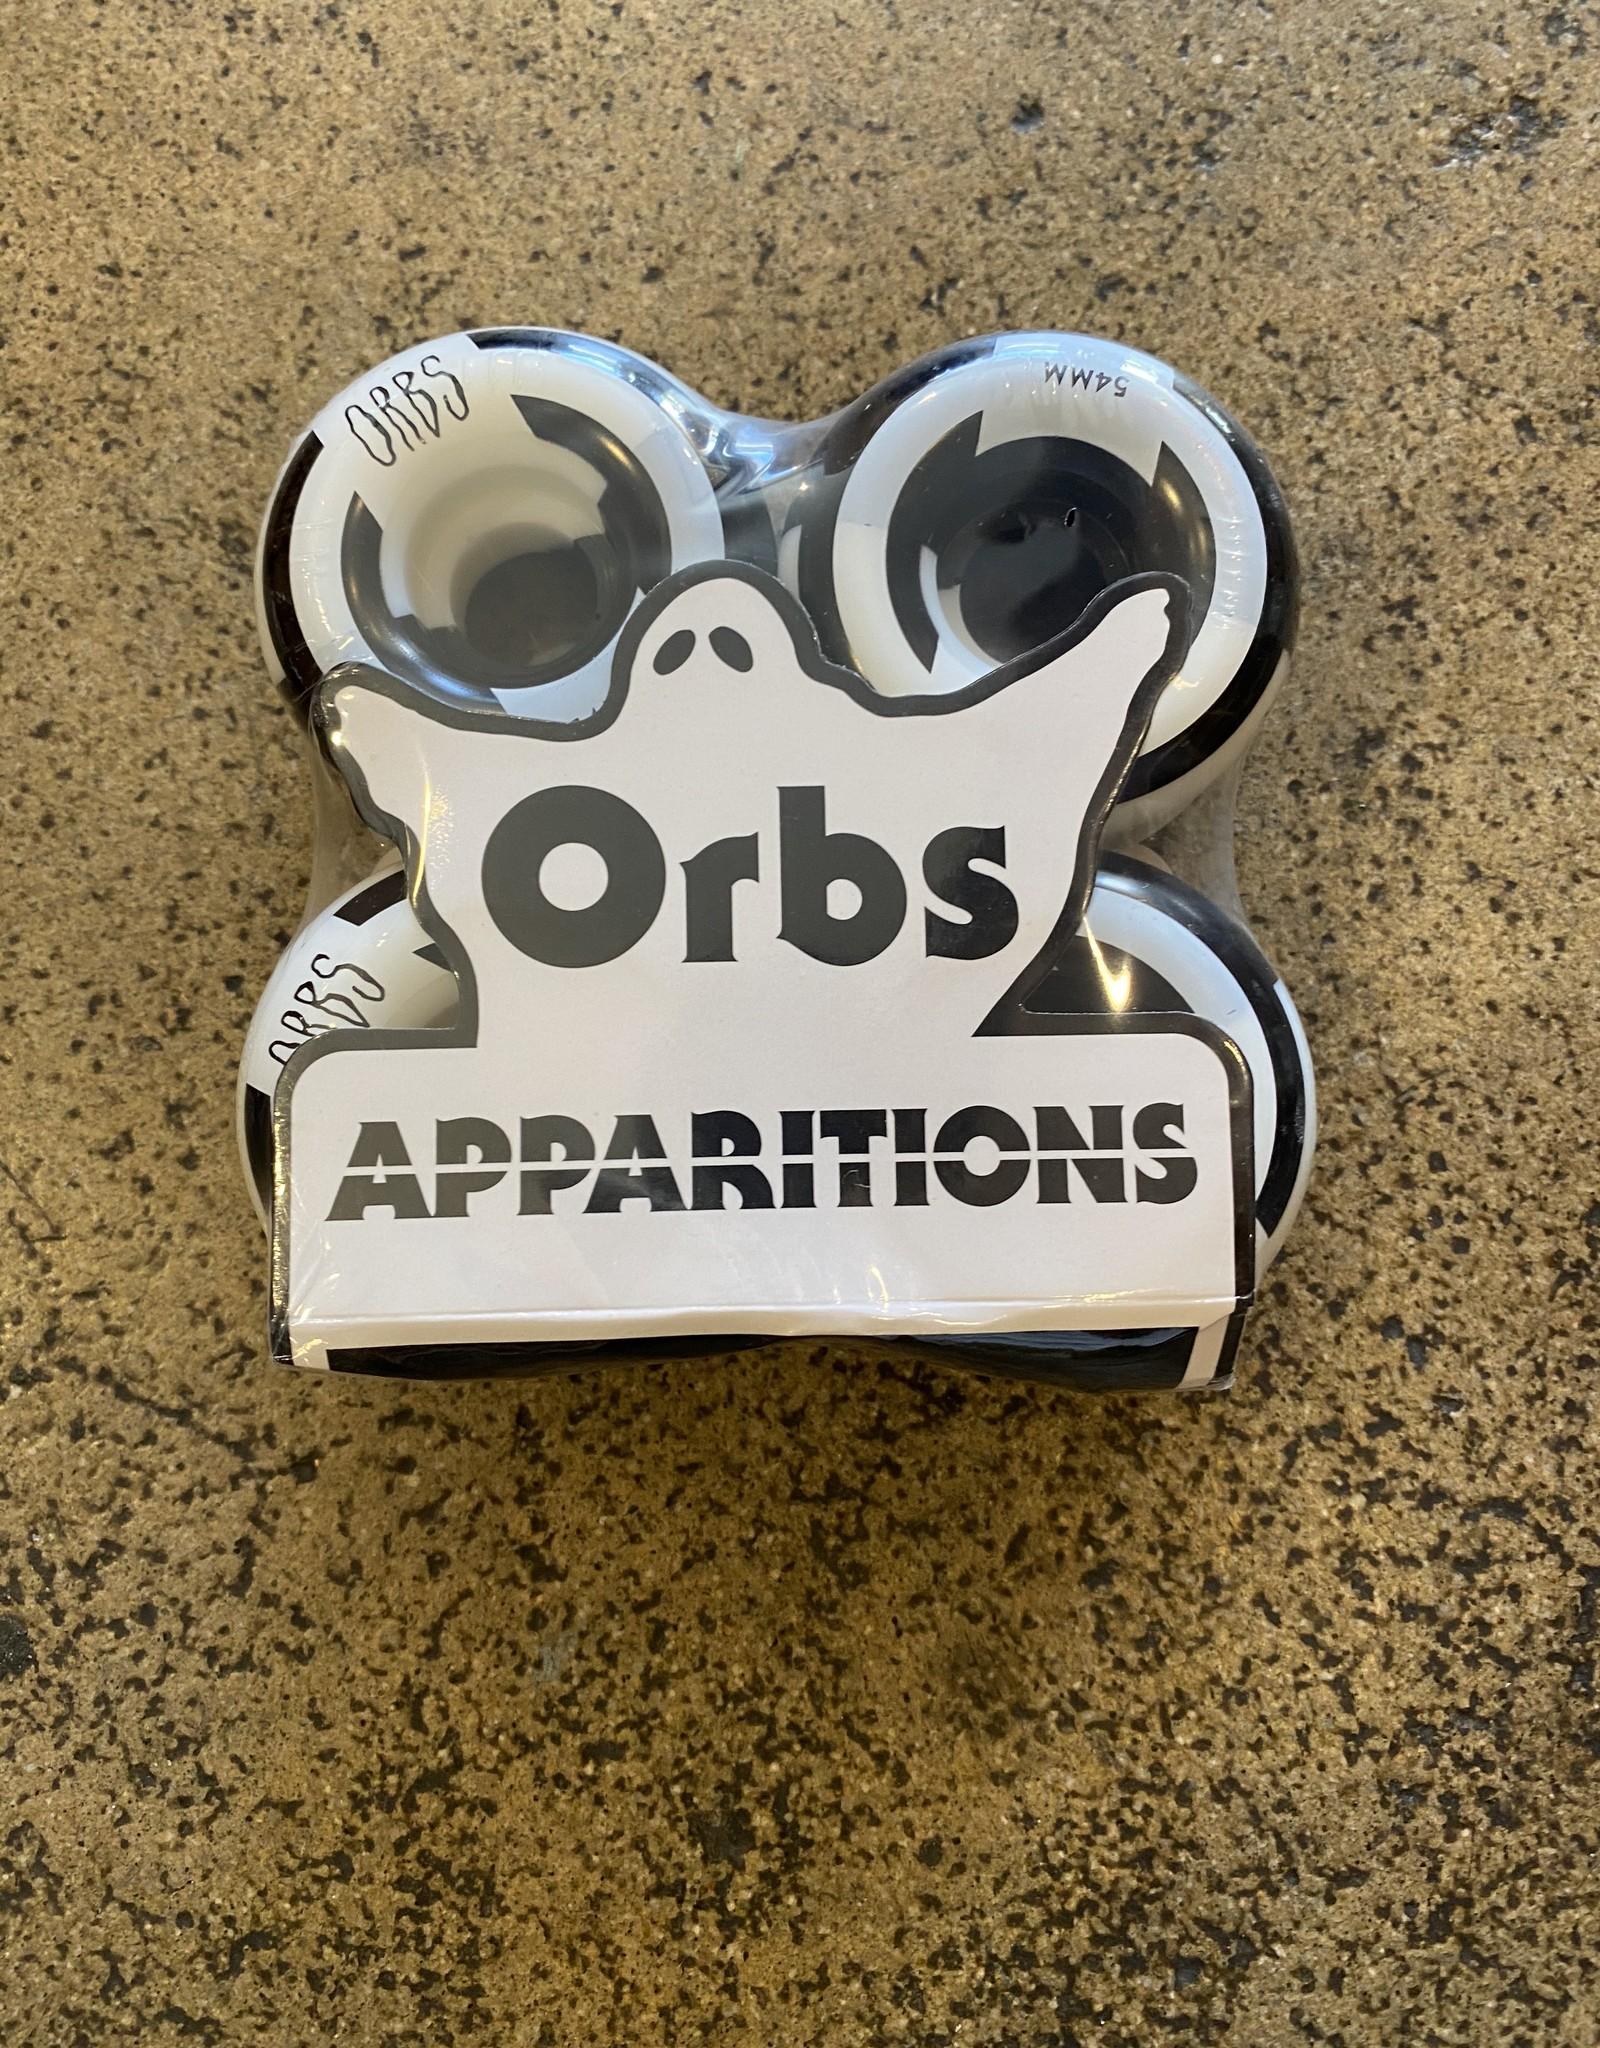 ORBS ORBS APPARITIONS SPLITS WHEEL - 54MM